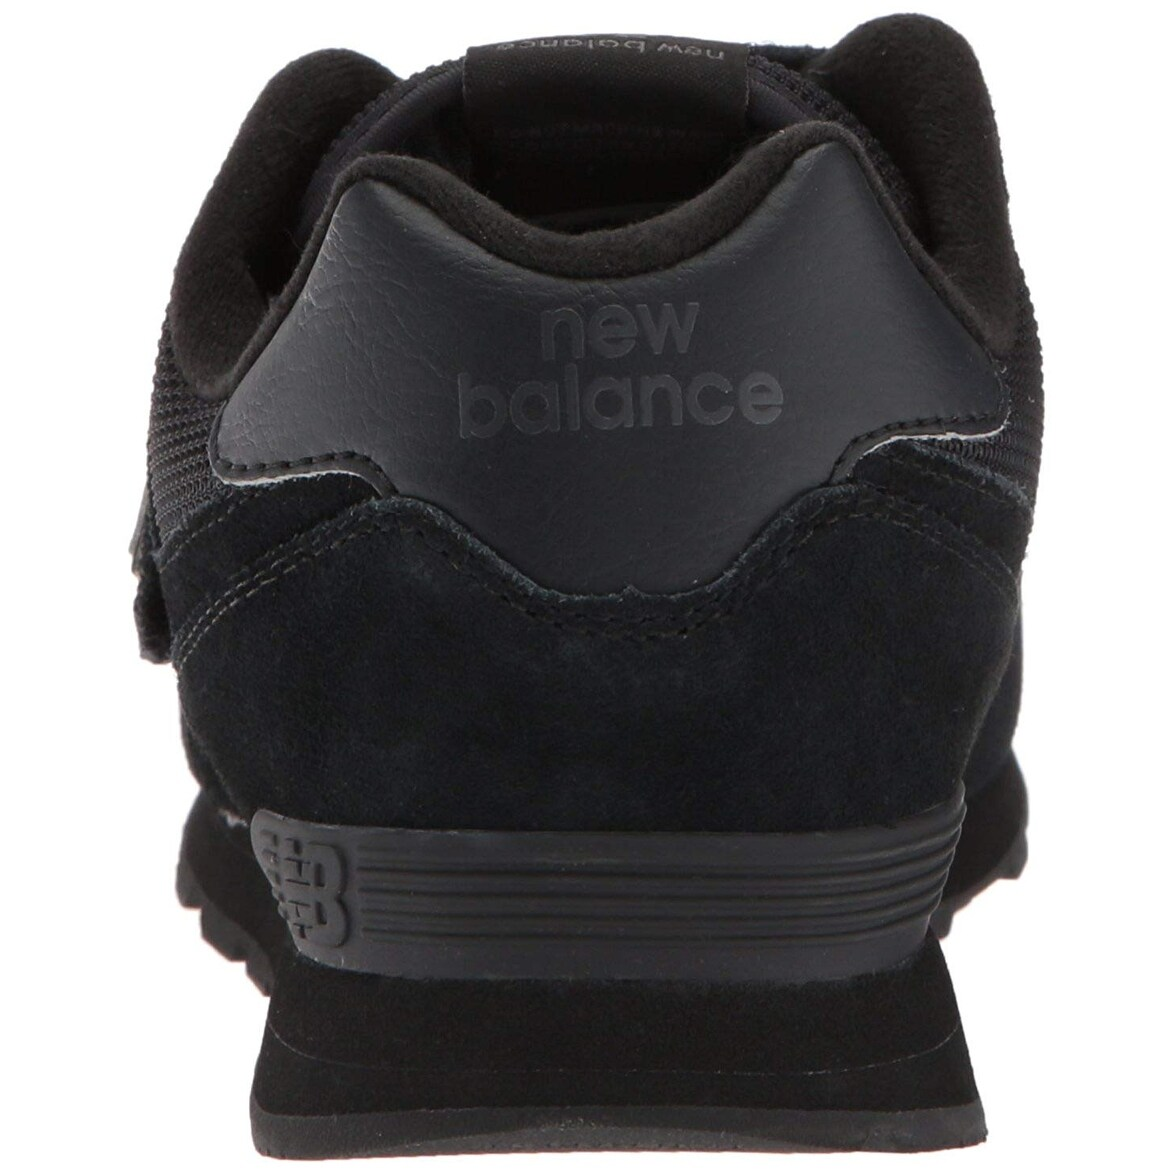 0dd3d51dcf35b New Balance Kids' 574v1 Essentials Hook and Loop Sneaker